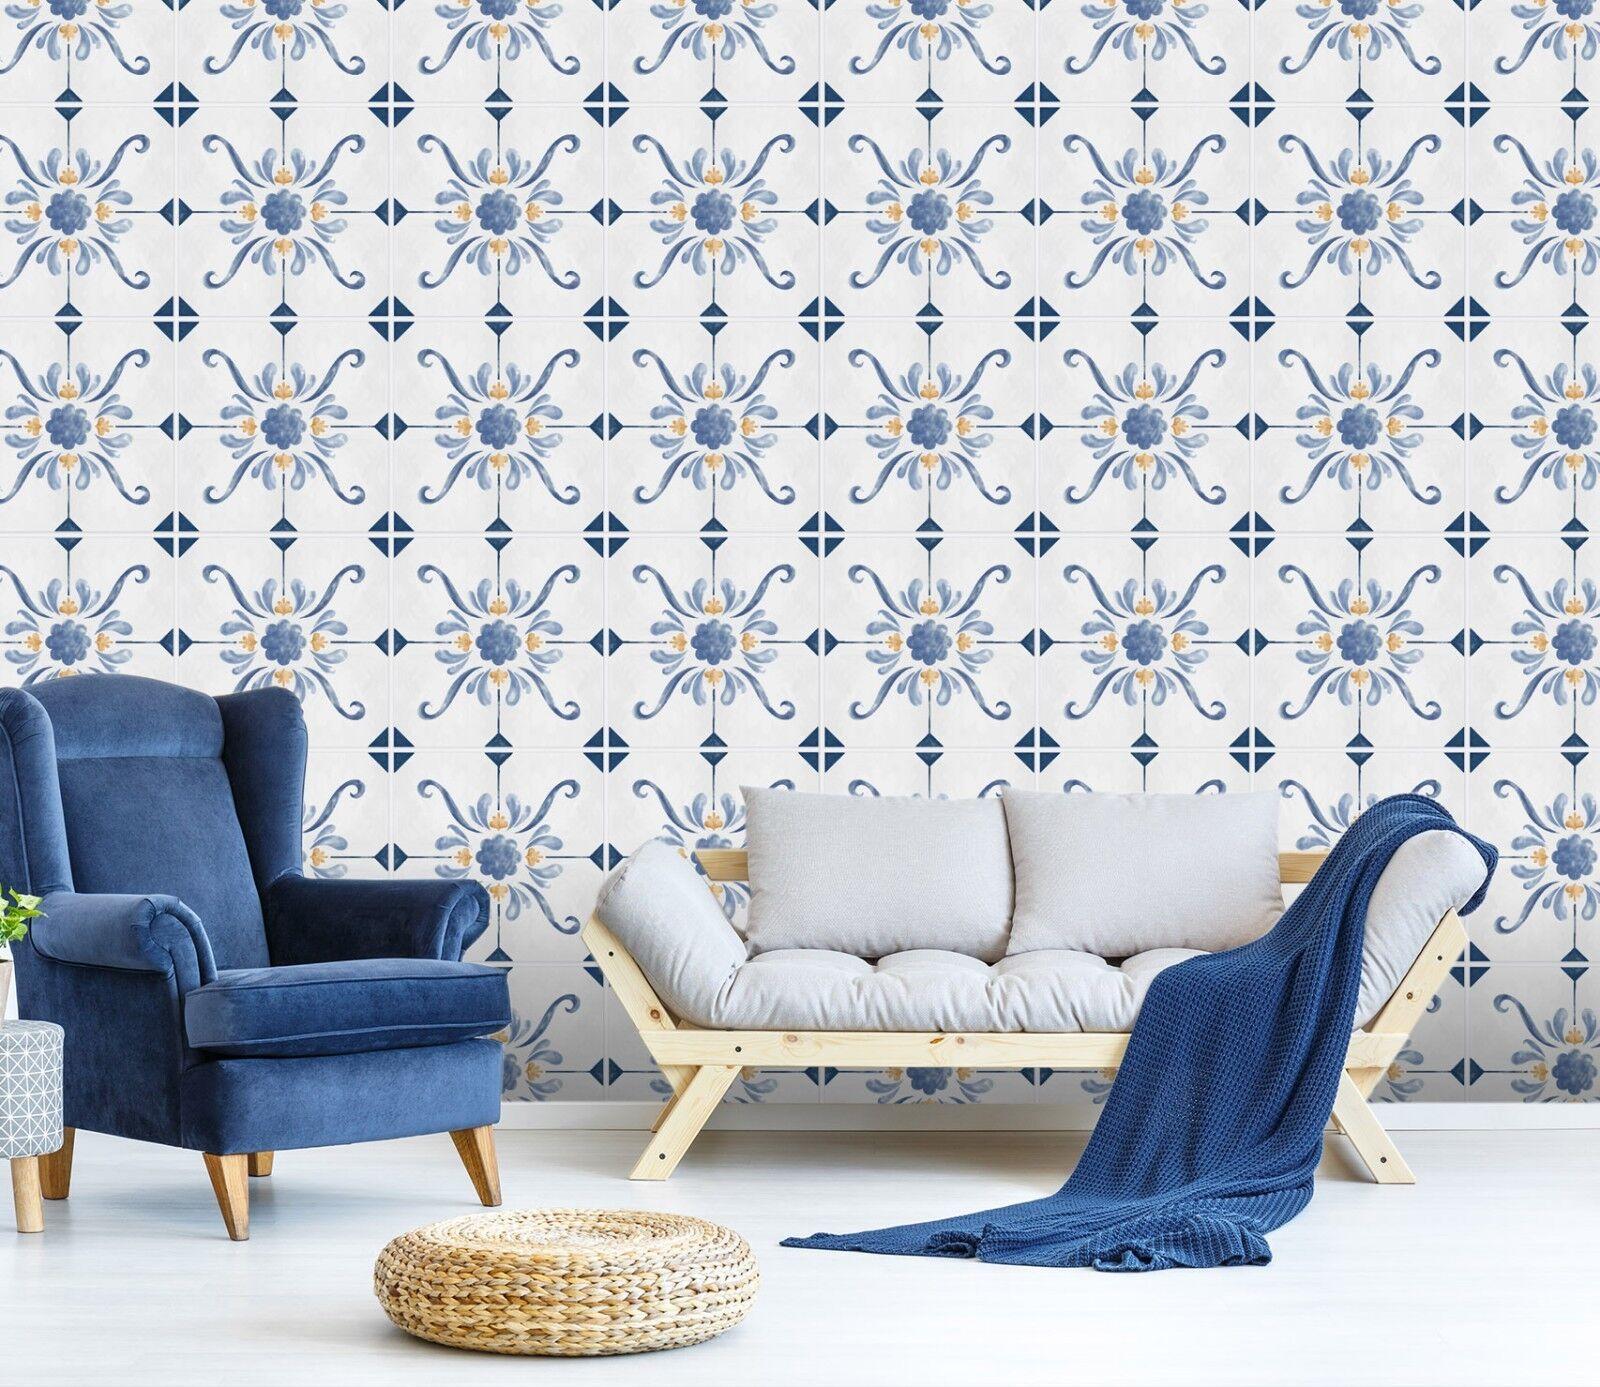 3D bluee Art Floral 223 Wallpaper Mural Print Wall Indoor Wallpaper Murals UK